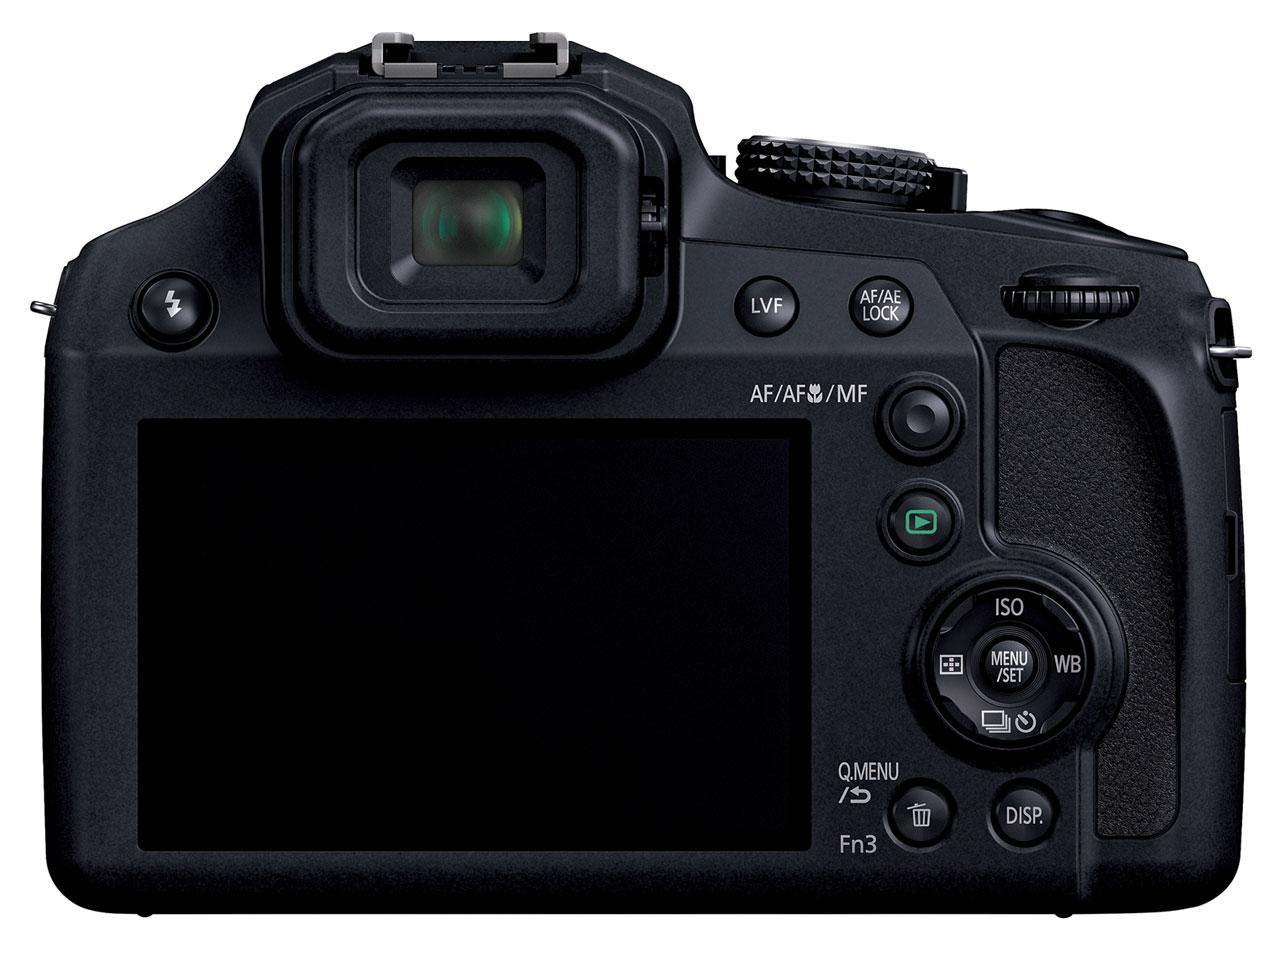 『本体 背面』 LUMIX DC-FZ85 の製品画像